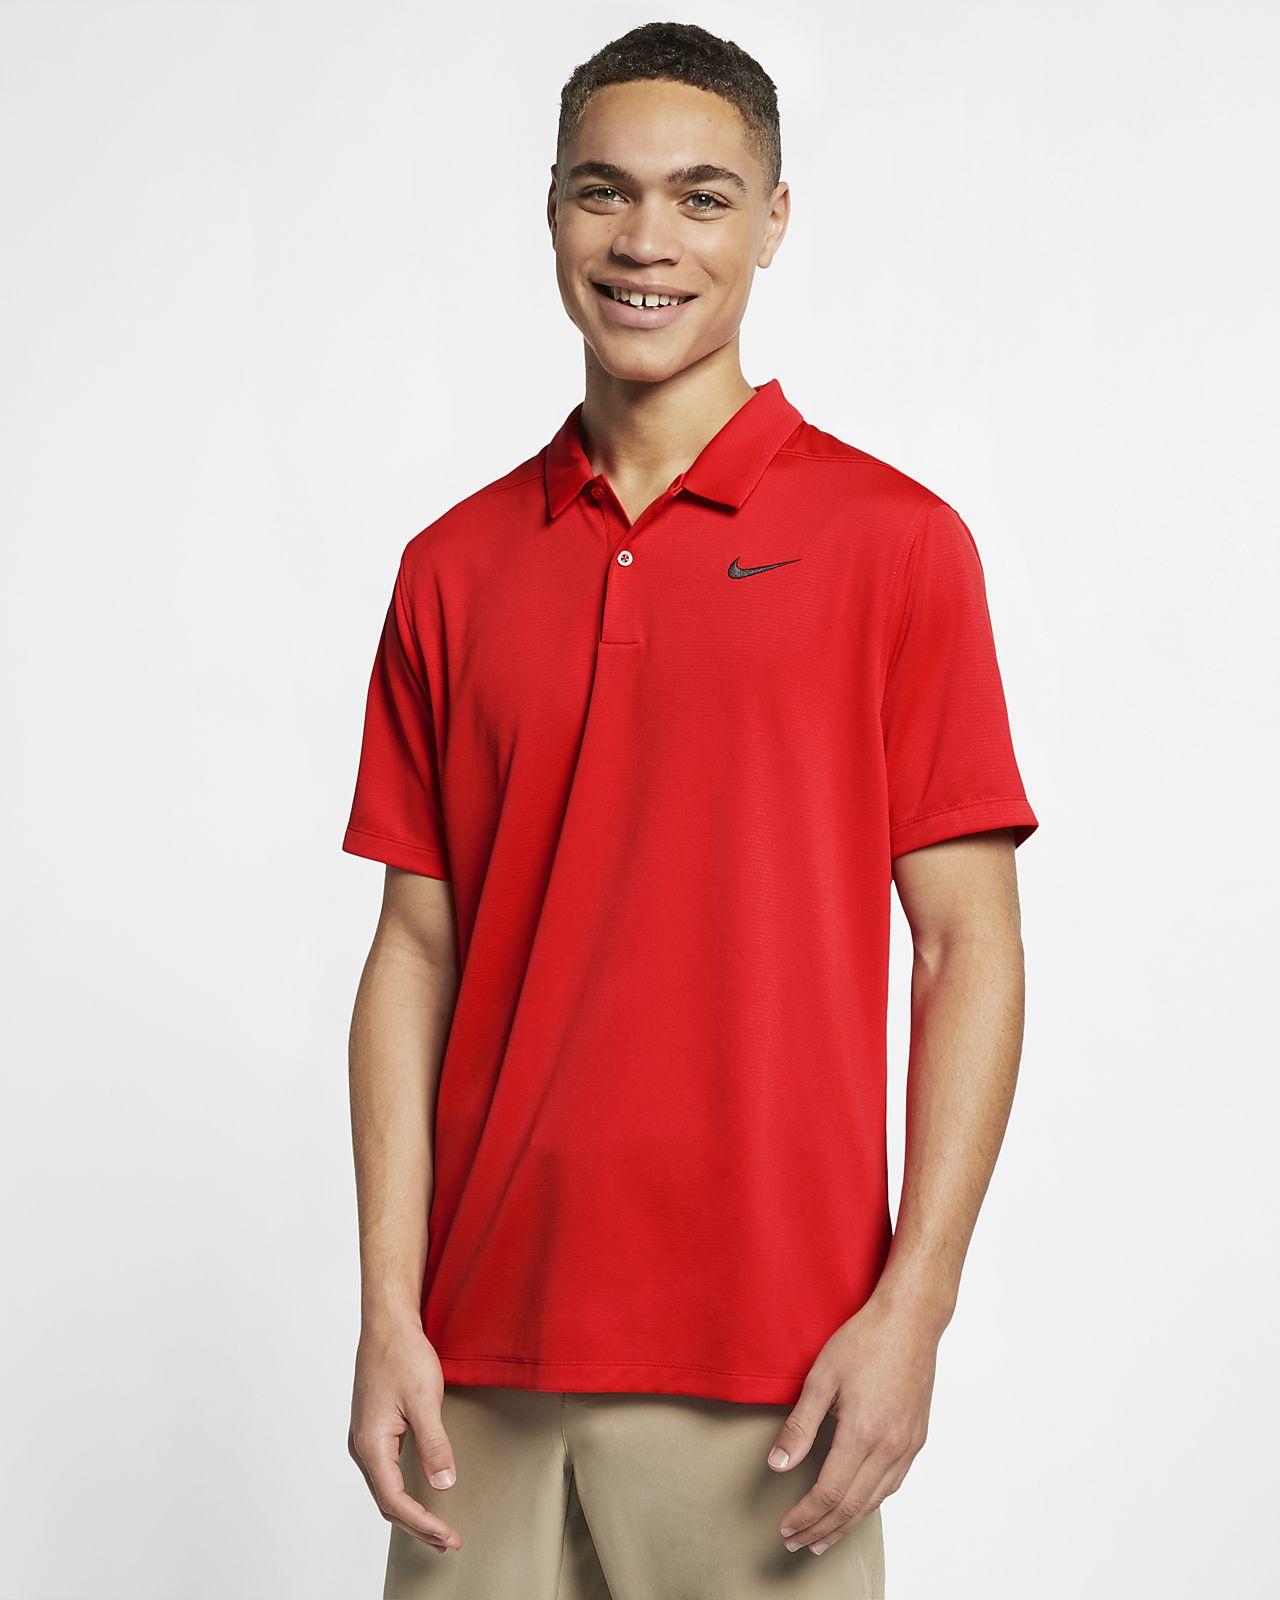 Nike Dri-FIT golfskjorte til herre